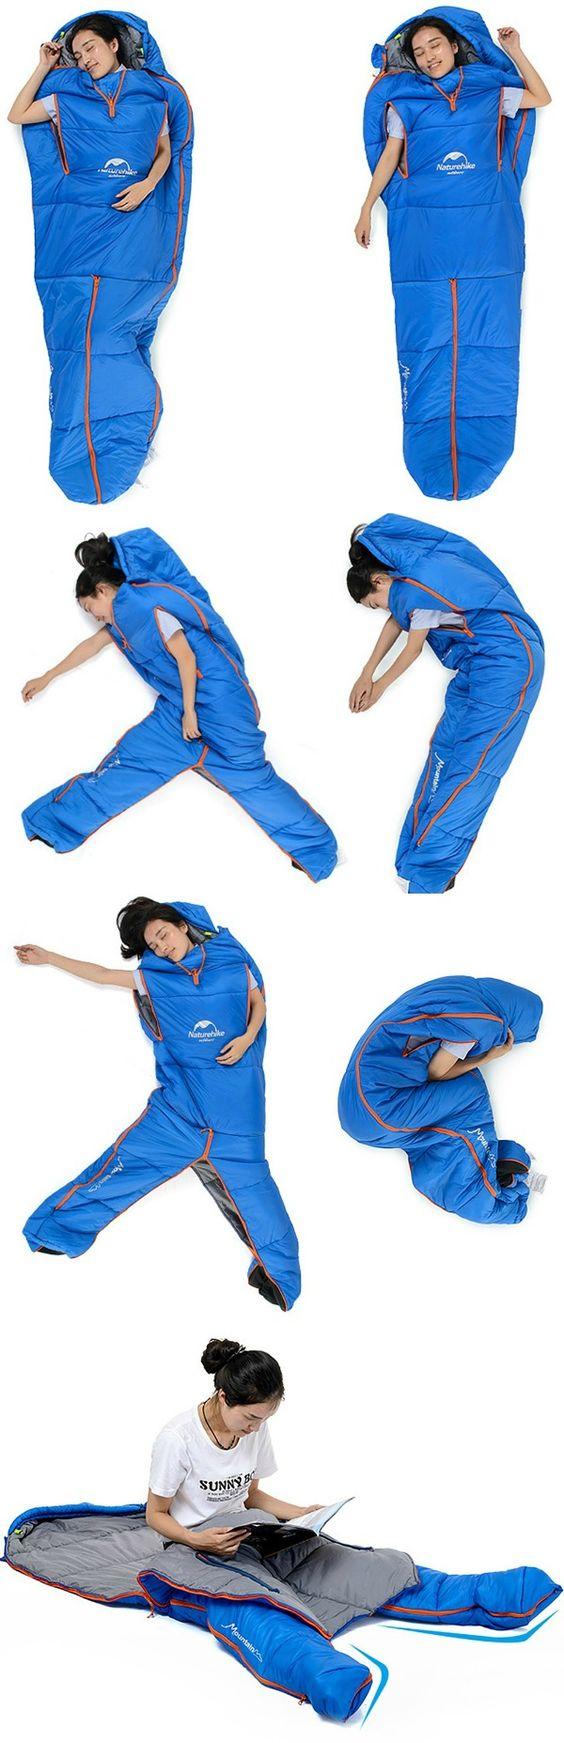 Sleep as you Wish with the Sleeping Bag Suit